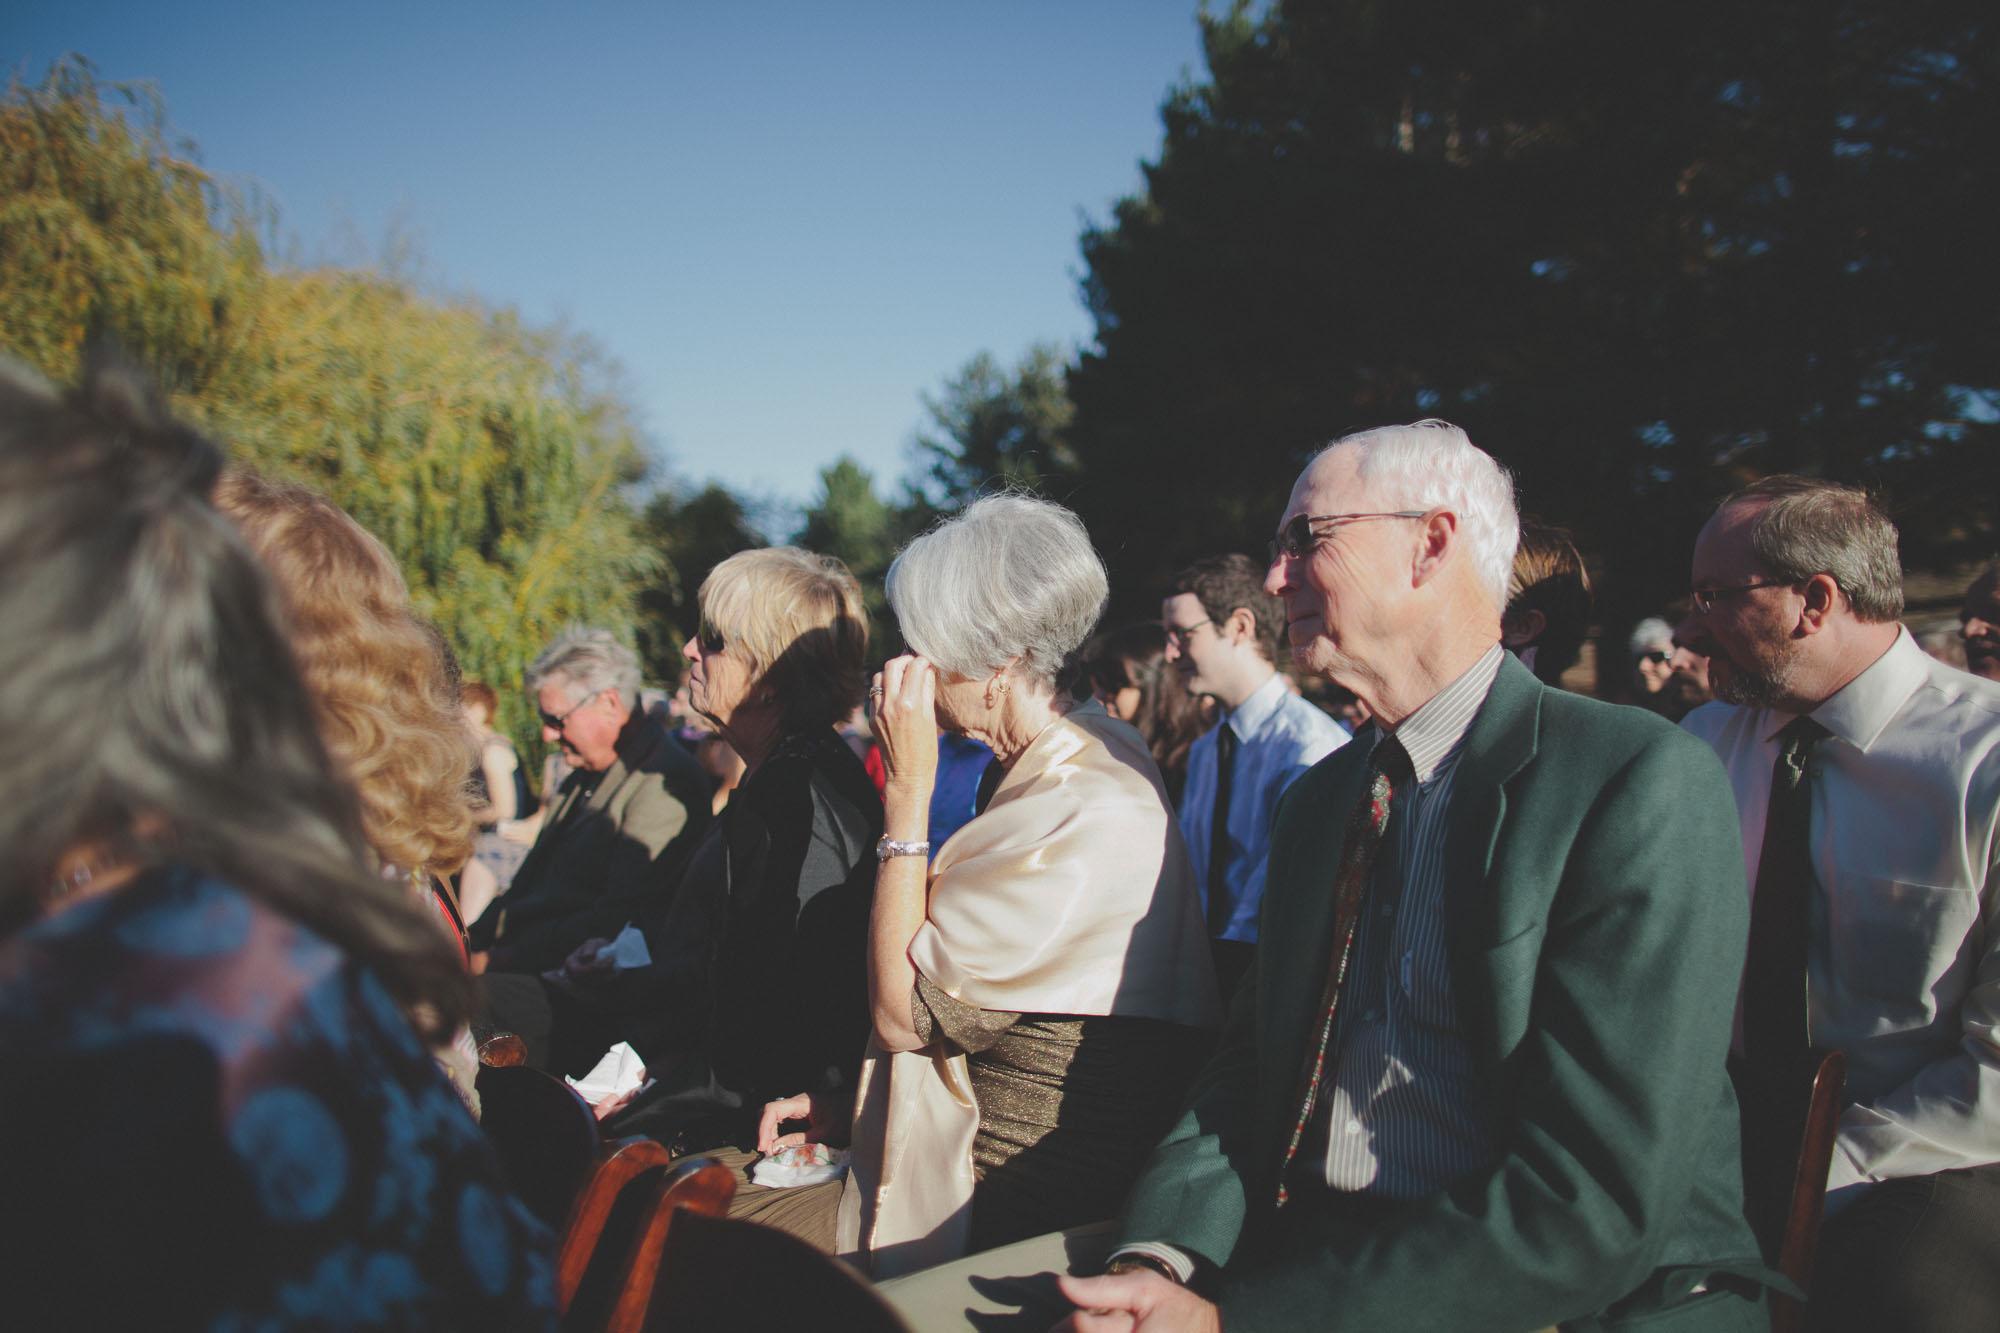 Gretchen_Gause_Petaluma_Olympias_Valley_Wedding_Photo-308.jpg